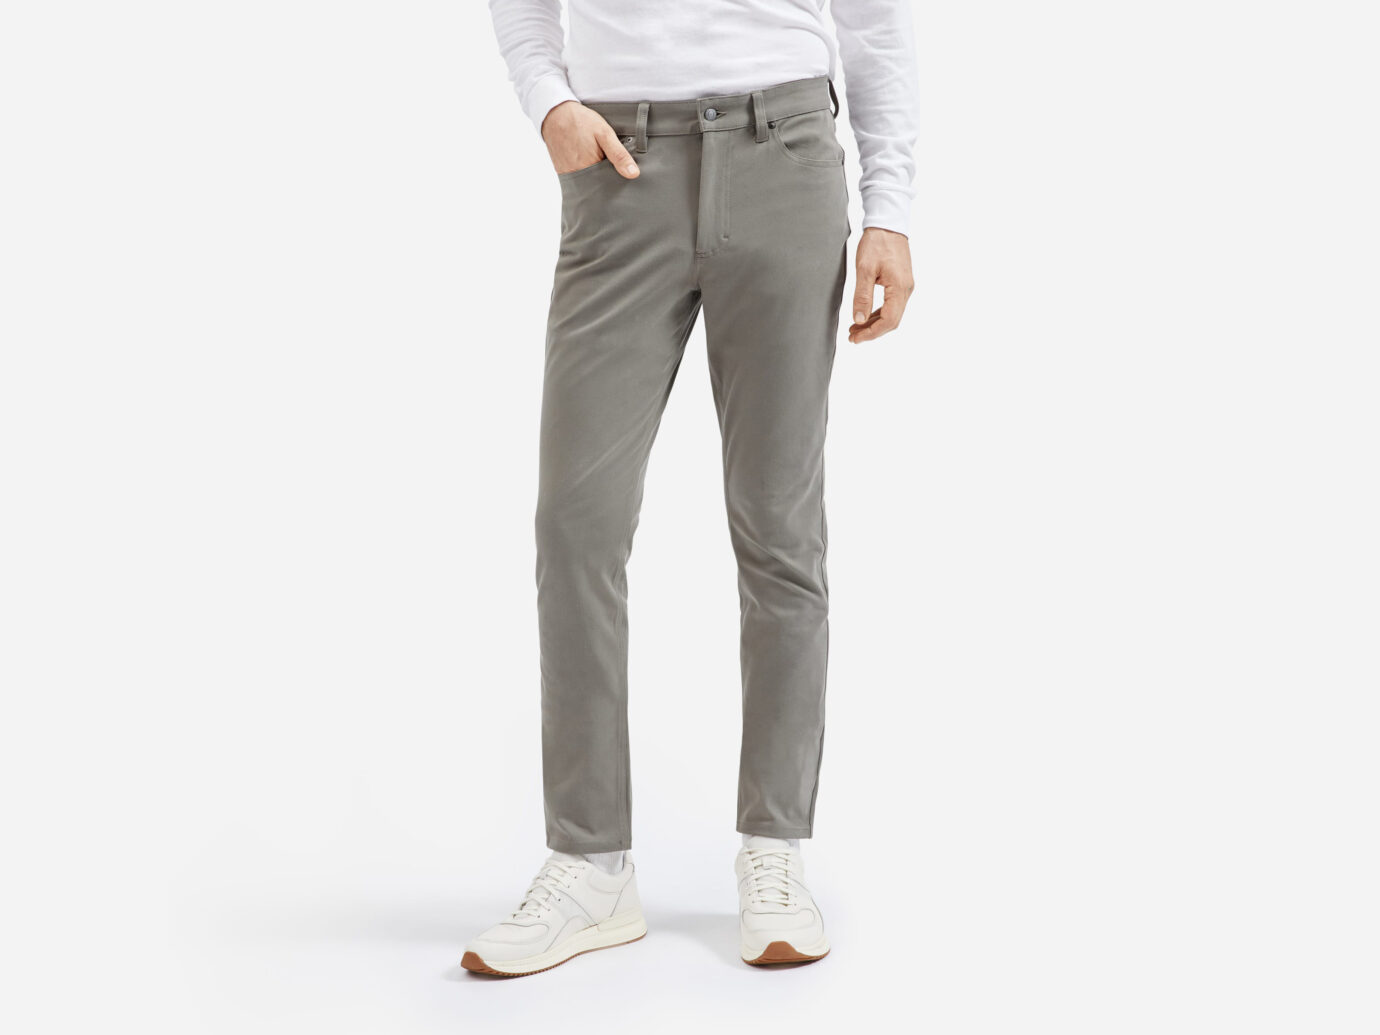 The Performance 5-Pocket Pant